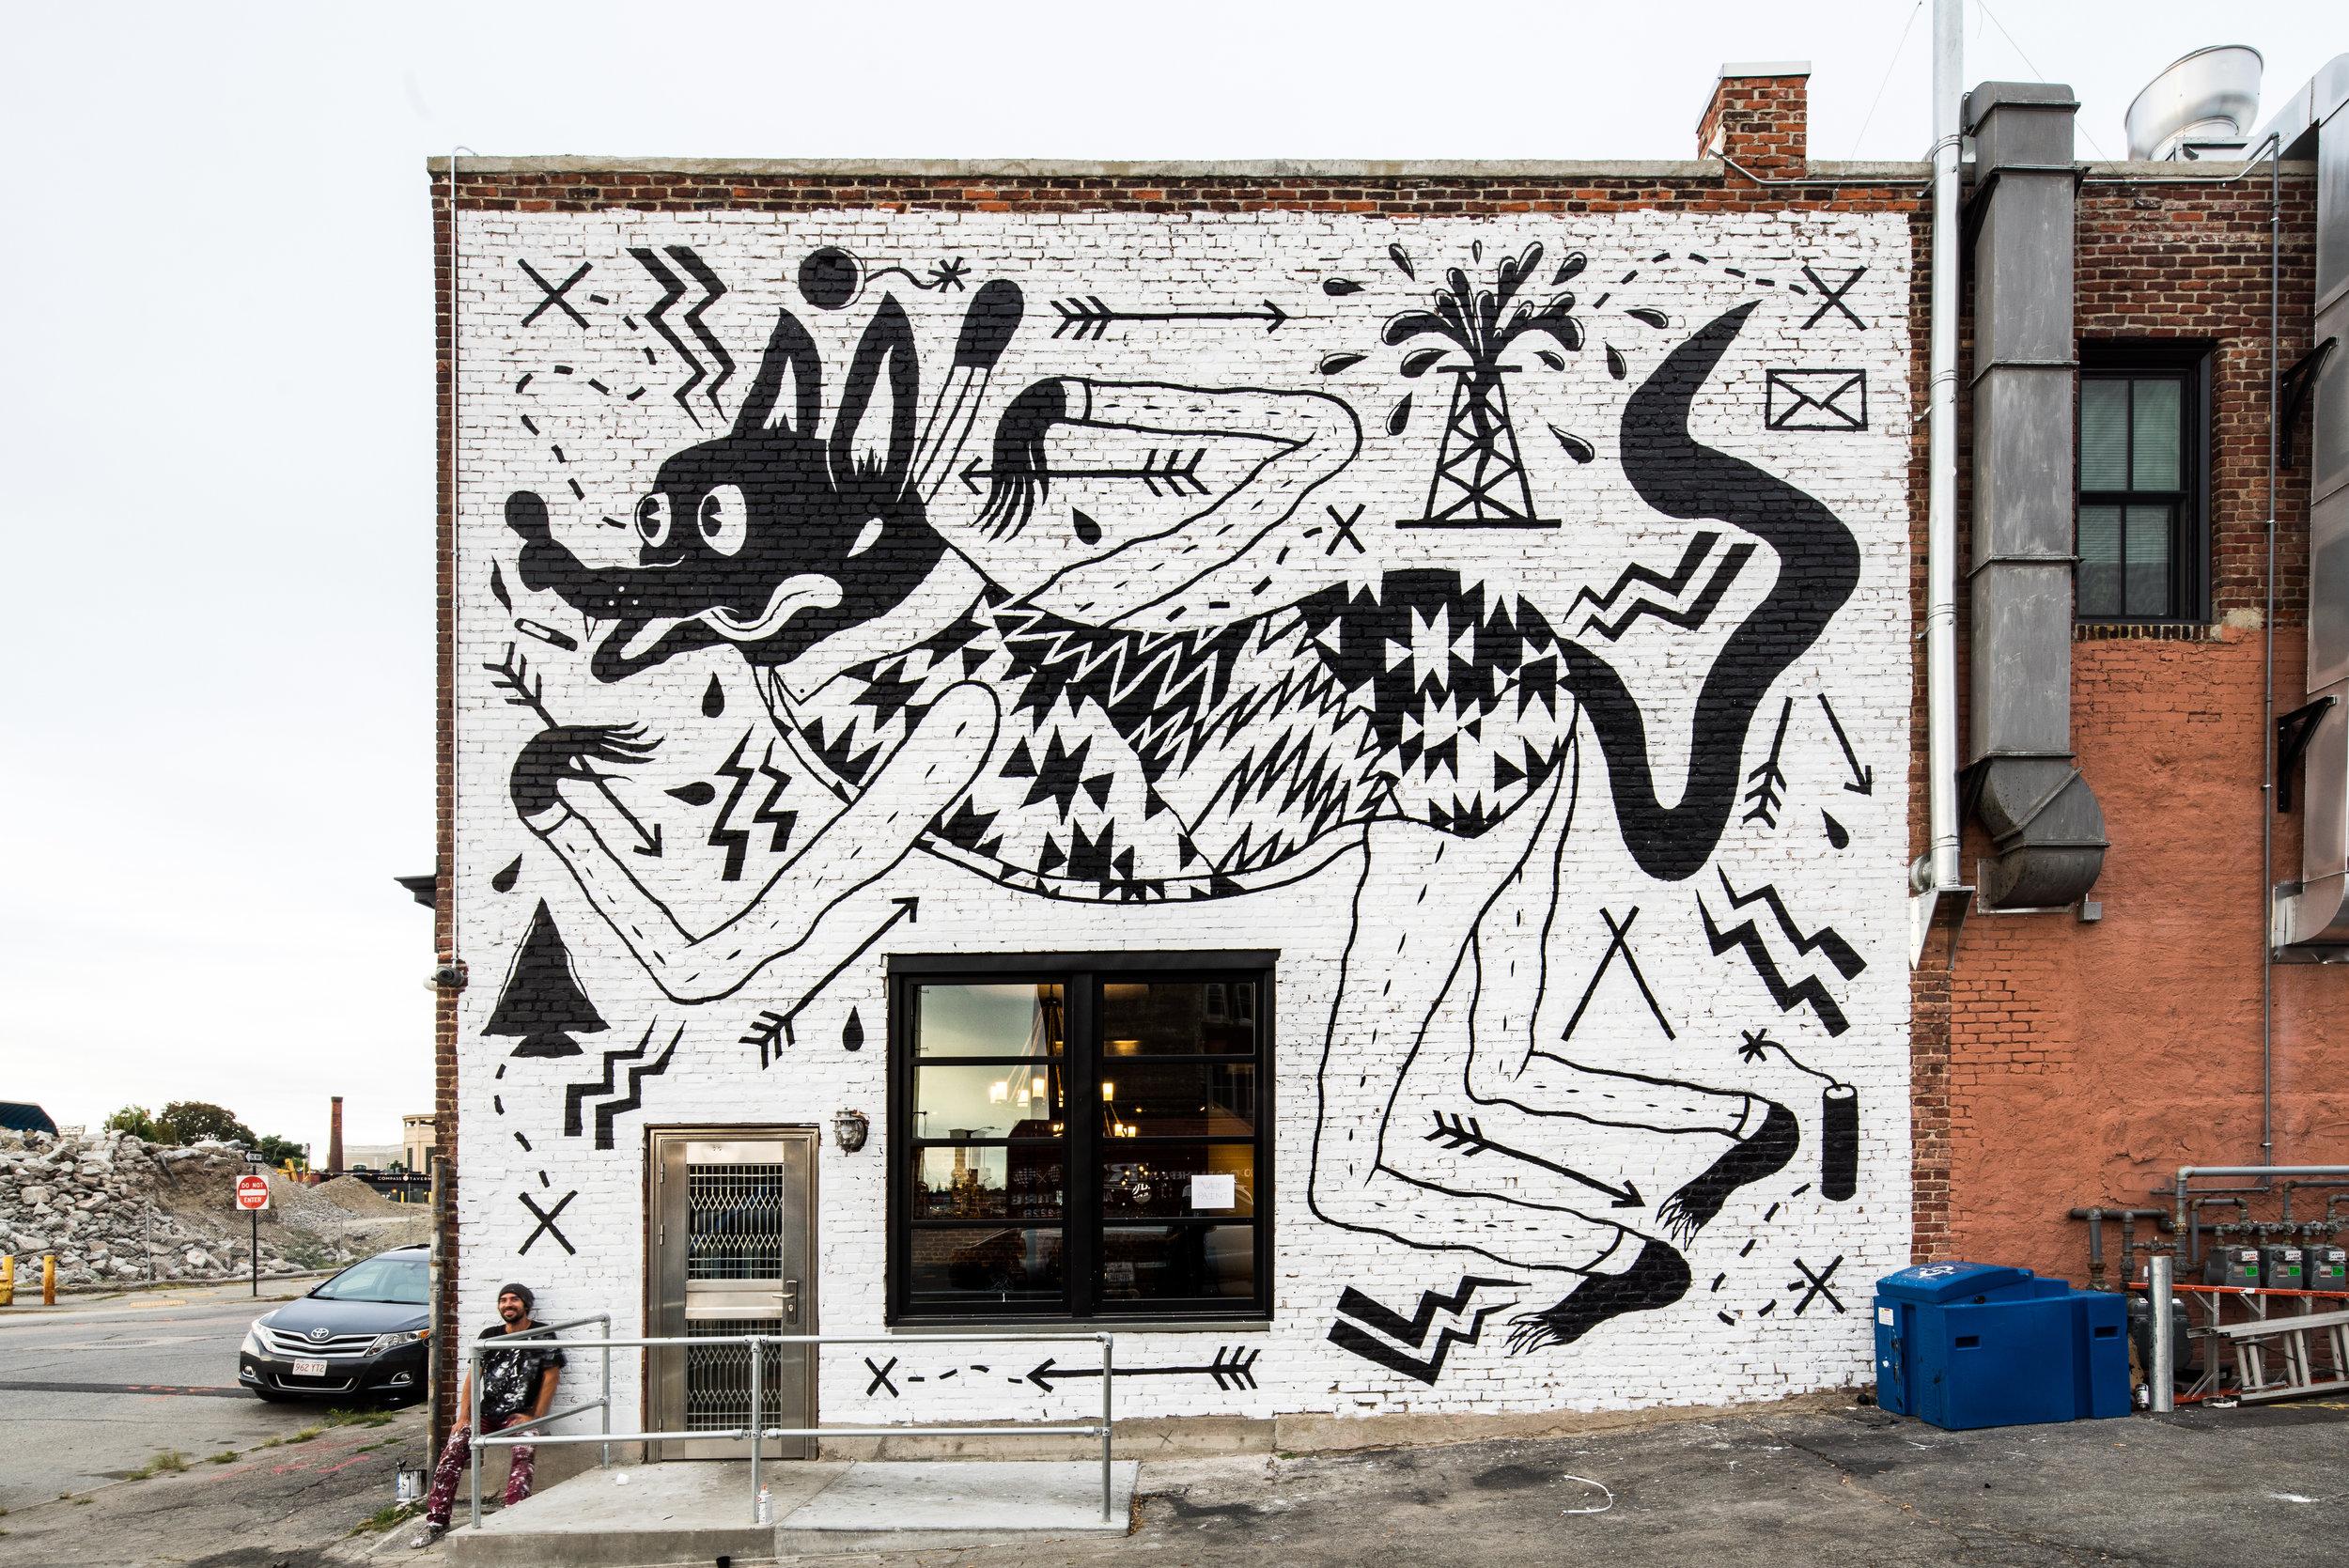 spencer_keeton_cunningham_dog-attacks_august-2016_standing-rock-mural_1.jpg